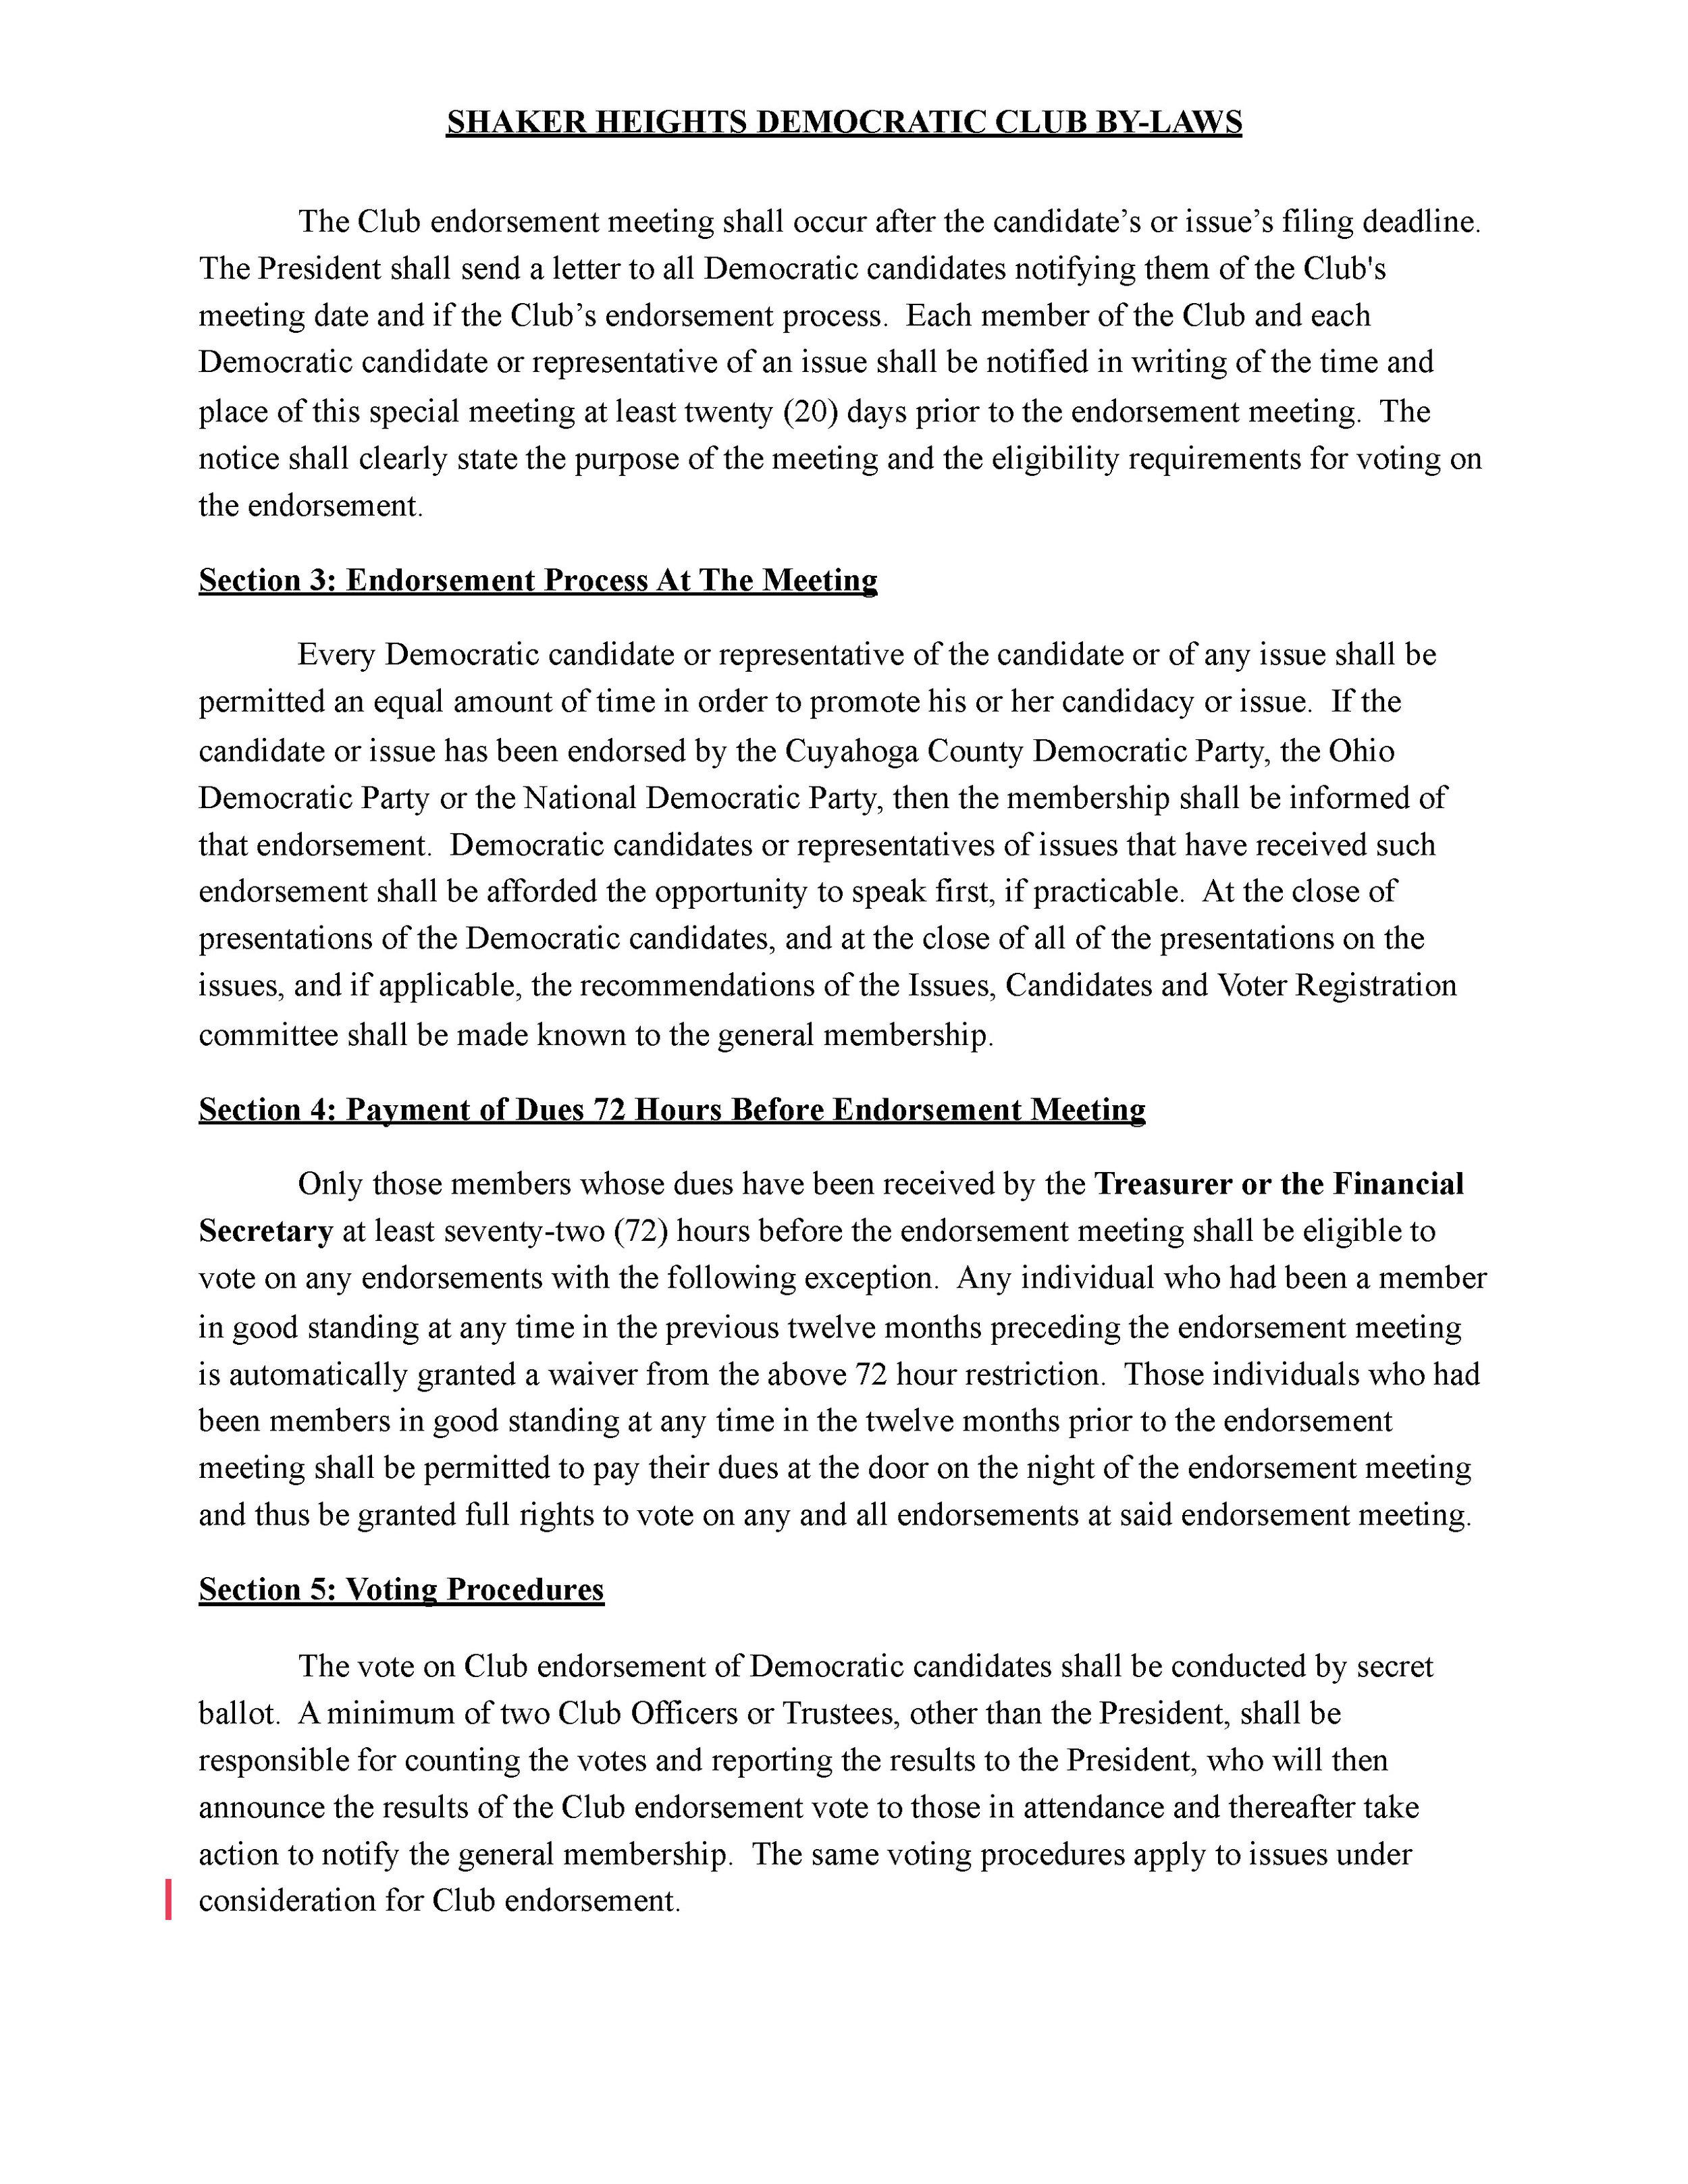 Shaker Dems Bylaws update Nov2018_Page_2.jpg